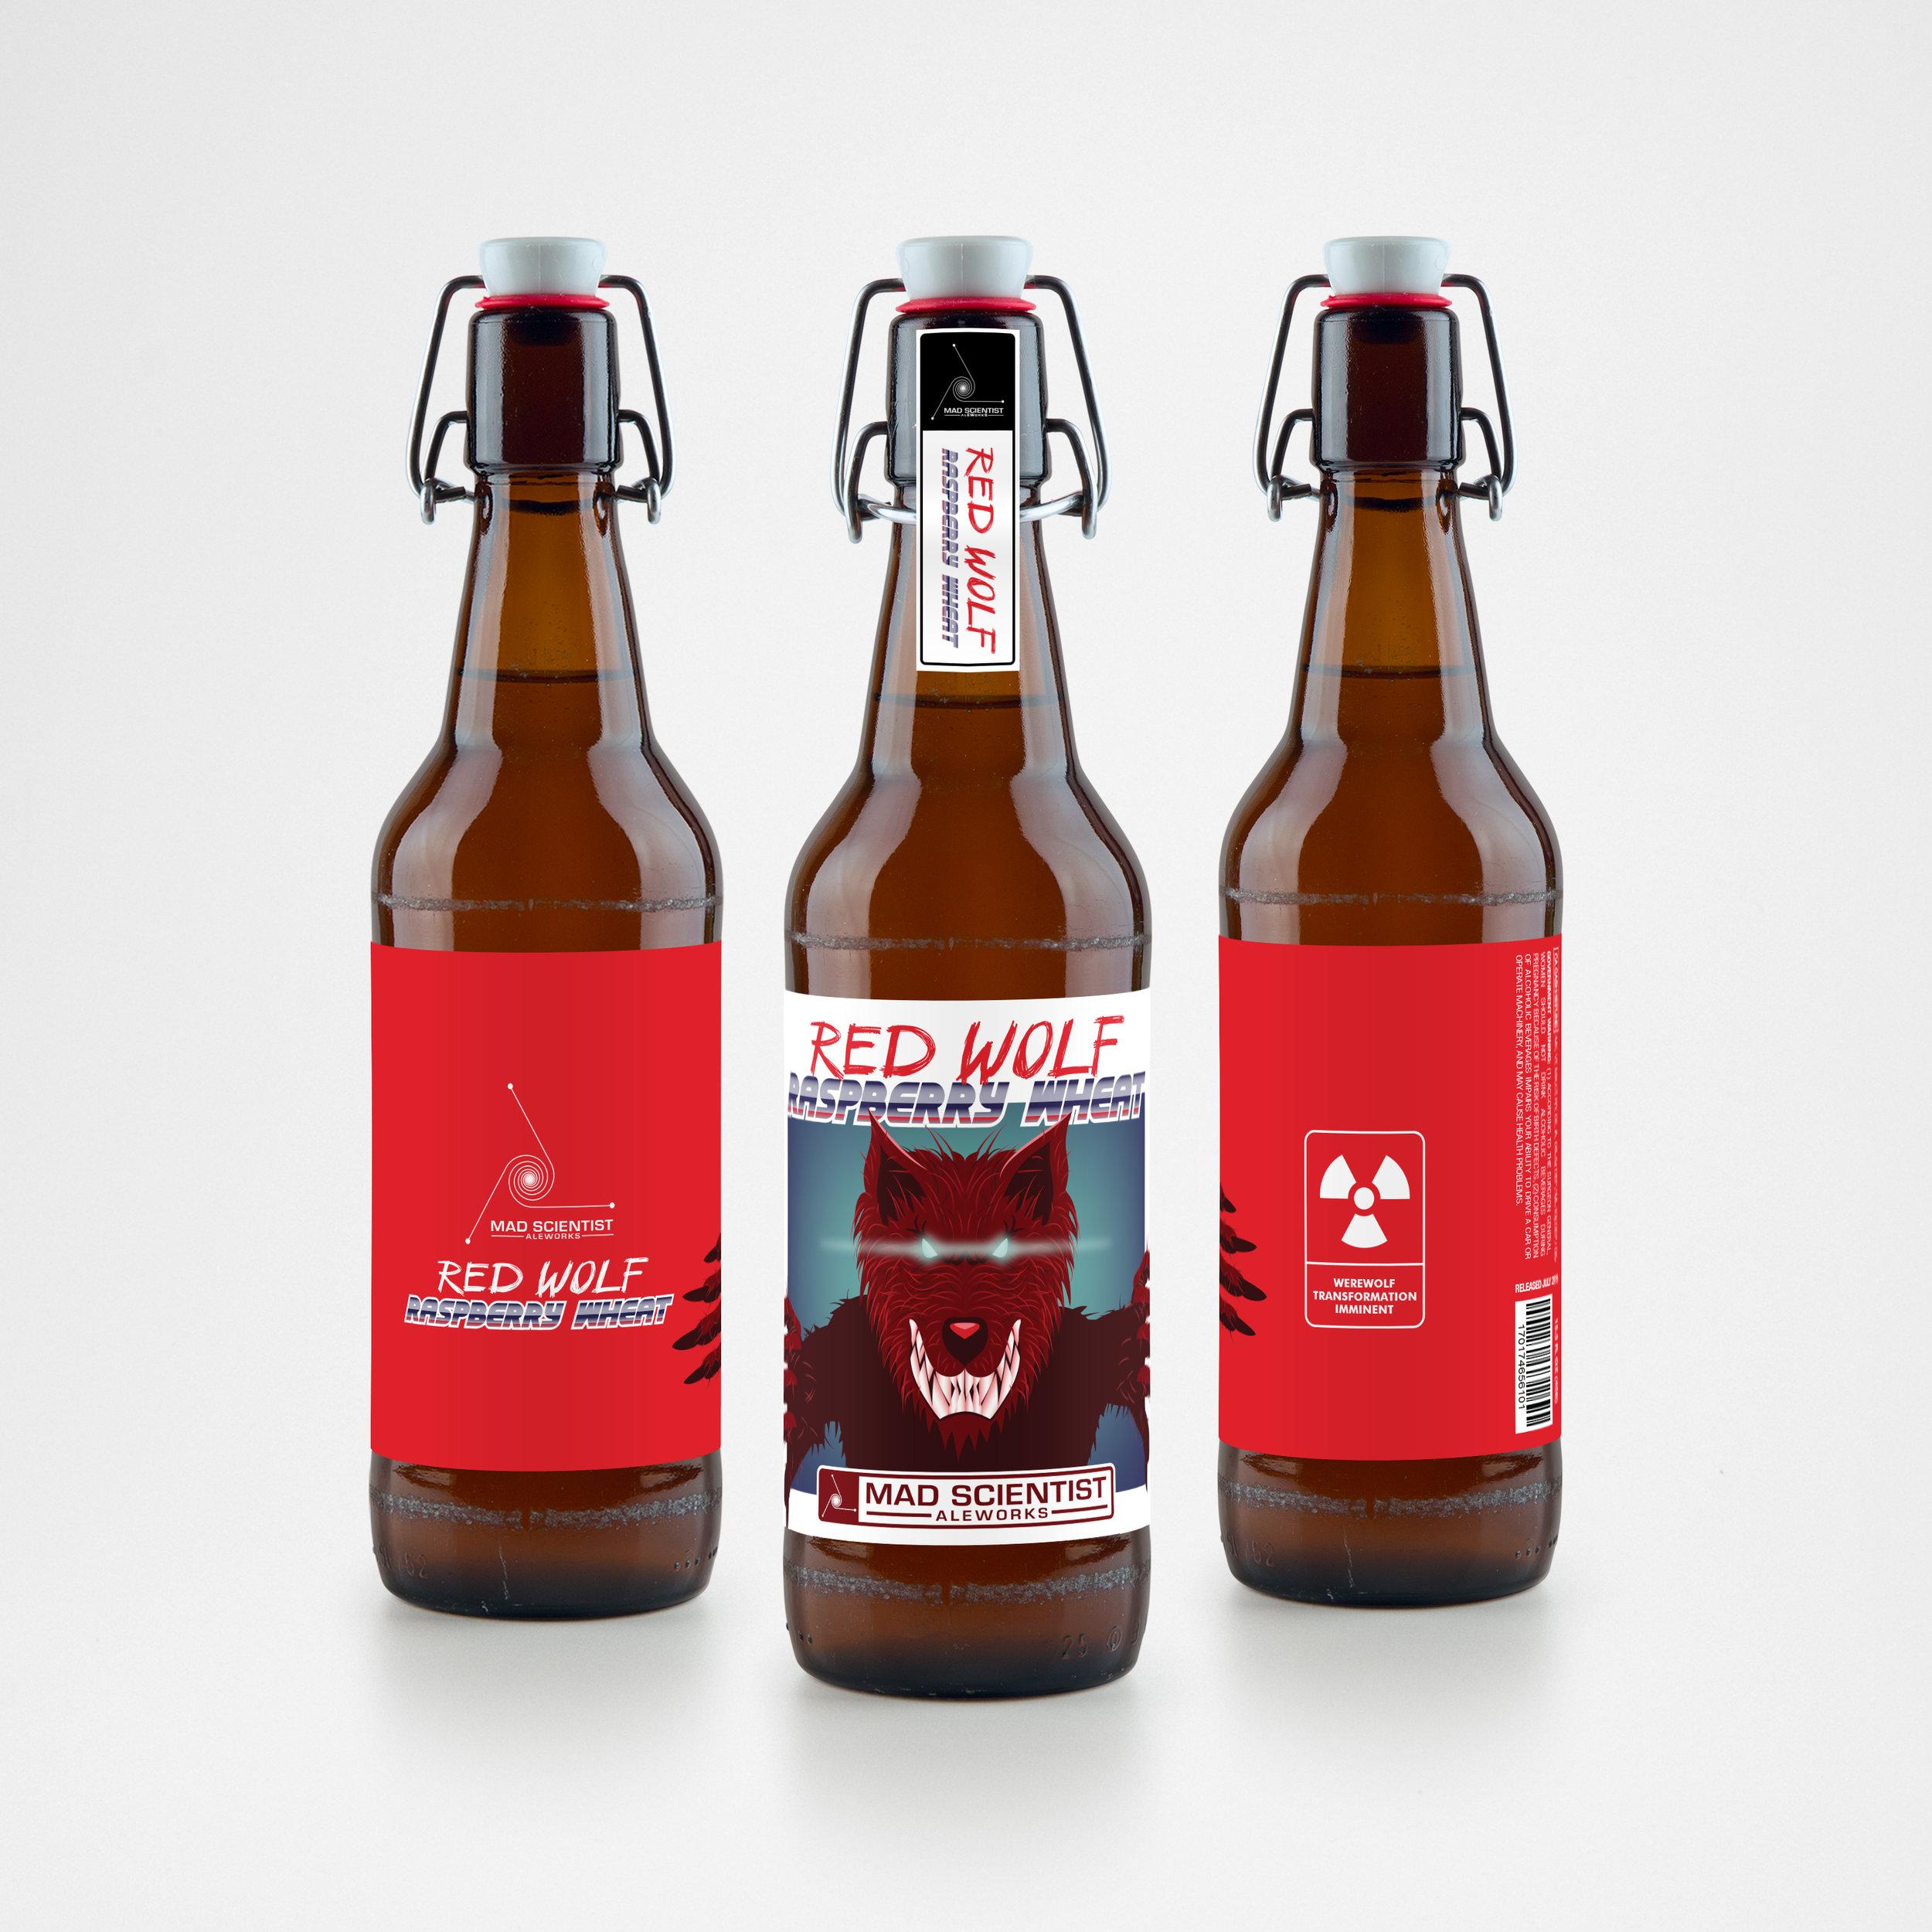 beer-branding-brewery-brand-strategy-logo-design-experiment-k-kyle-dolan-illustration-003.jpg